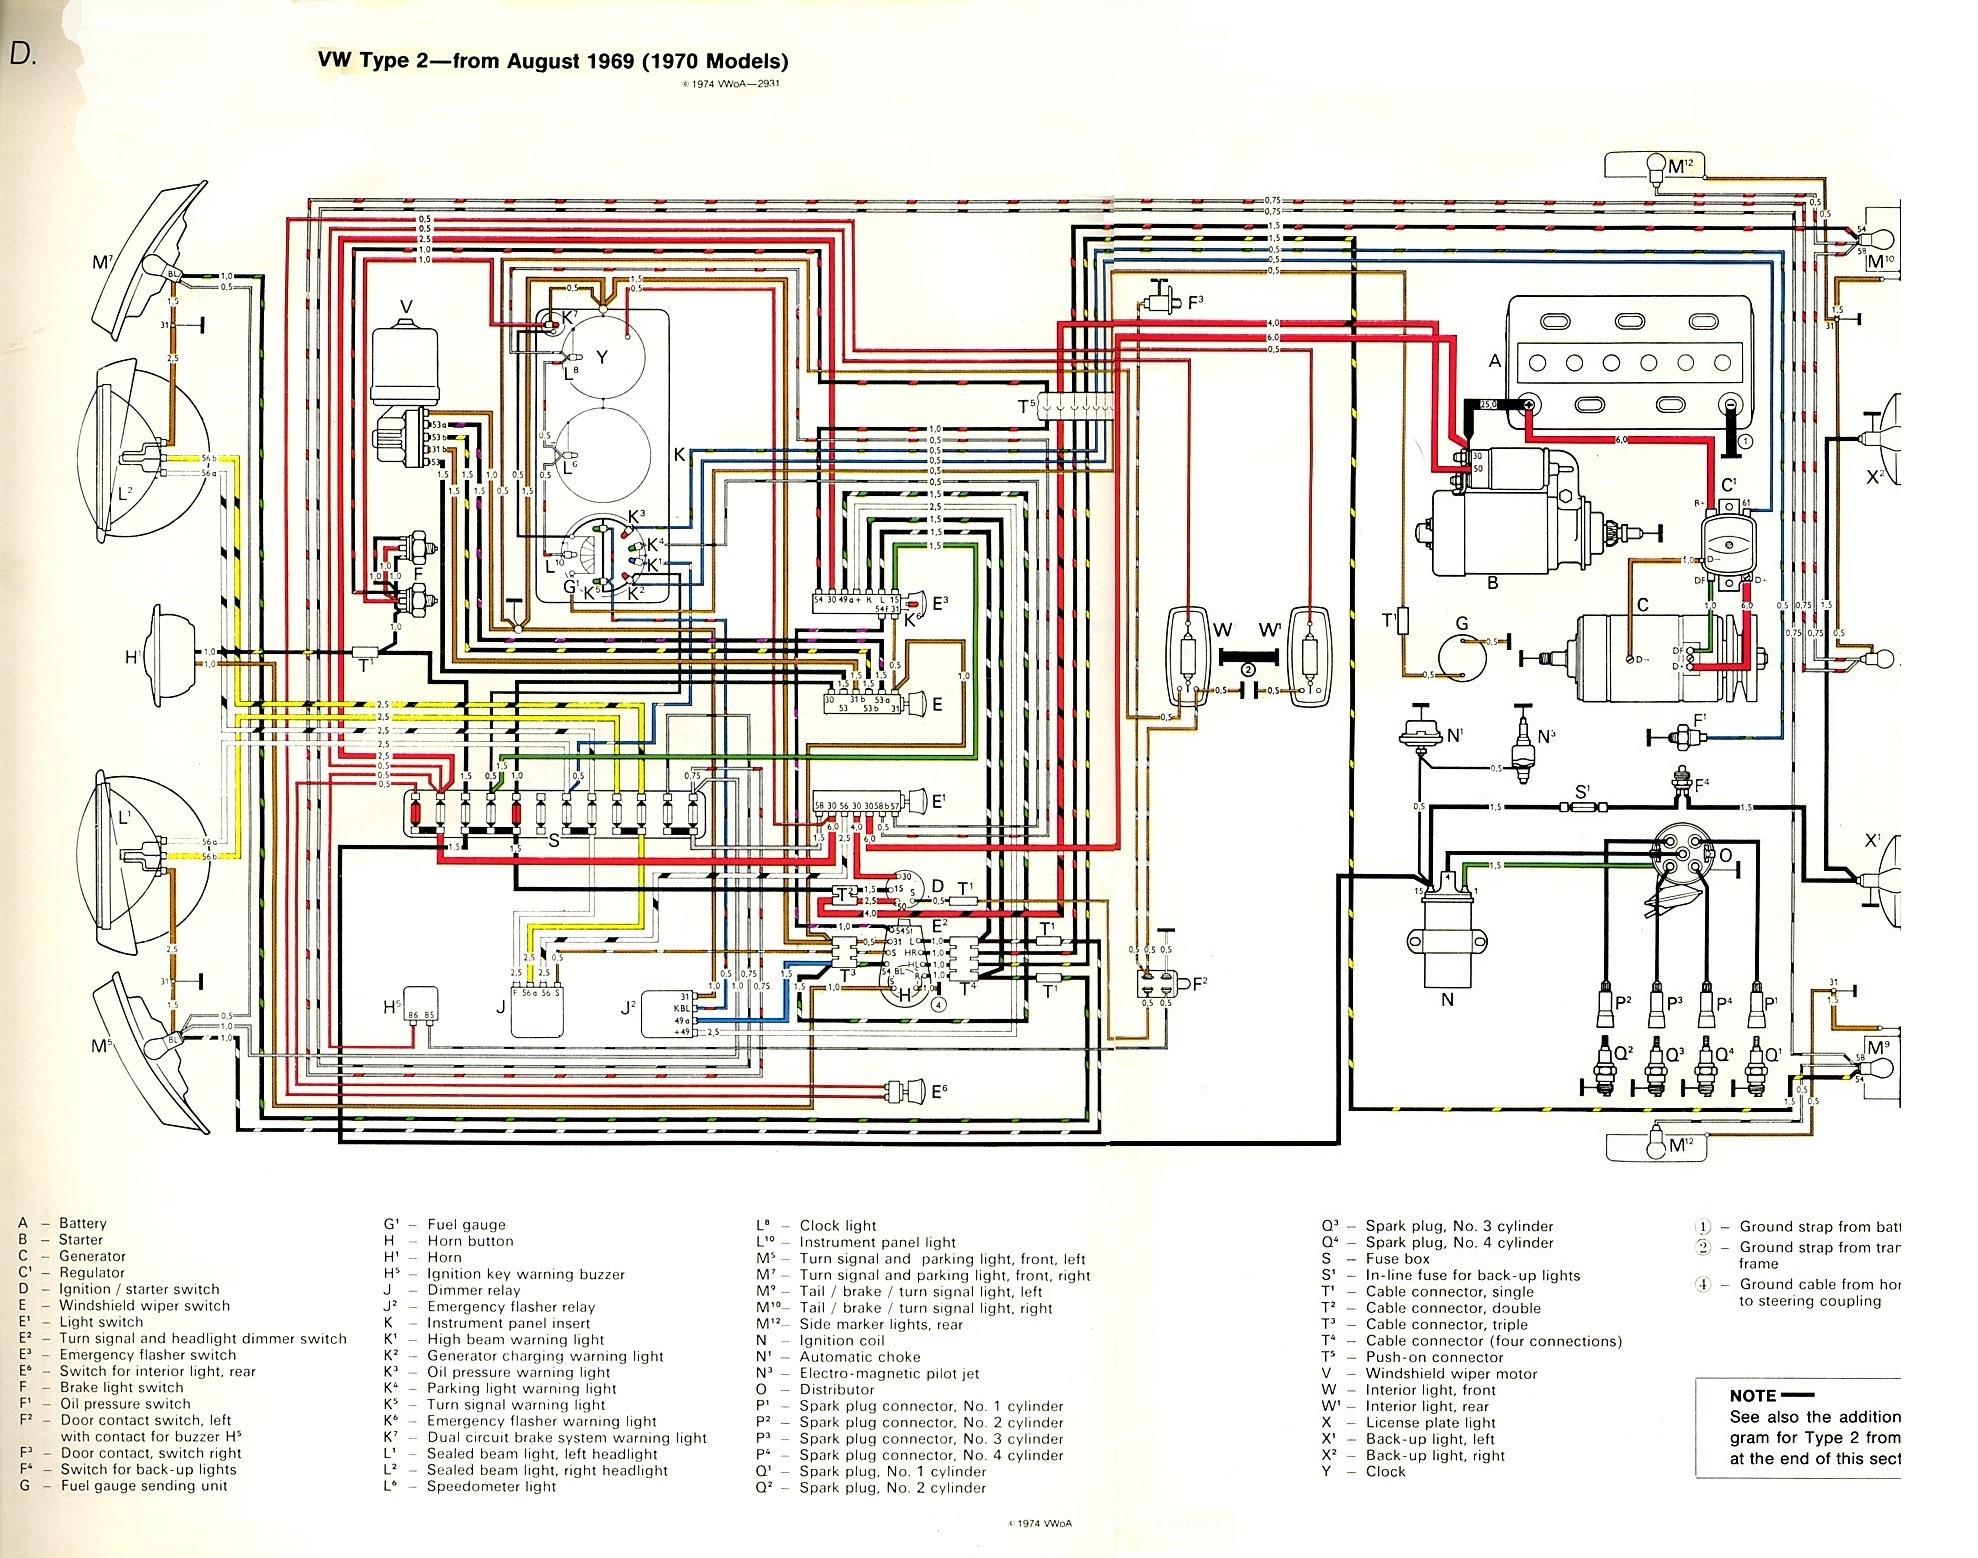 peterbilt 320 fuse box diagram online wiring diagram. Black Bedroom Furniture Sets. Home Design Ideas